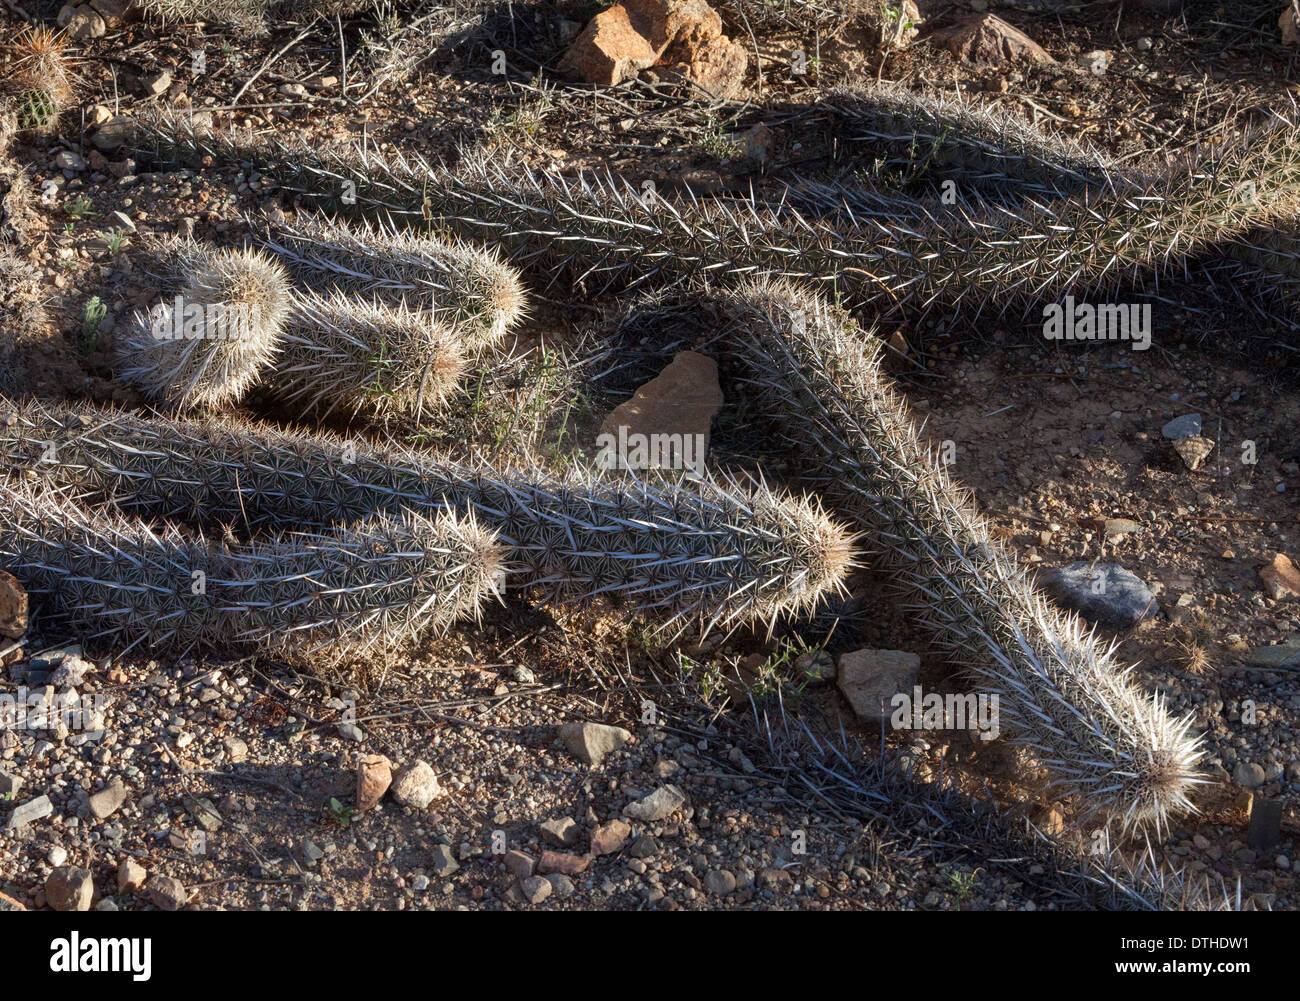 Creeping Devil Cactus pitayo chirinola Stenocereus eruca - Stock Image